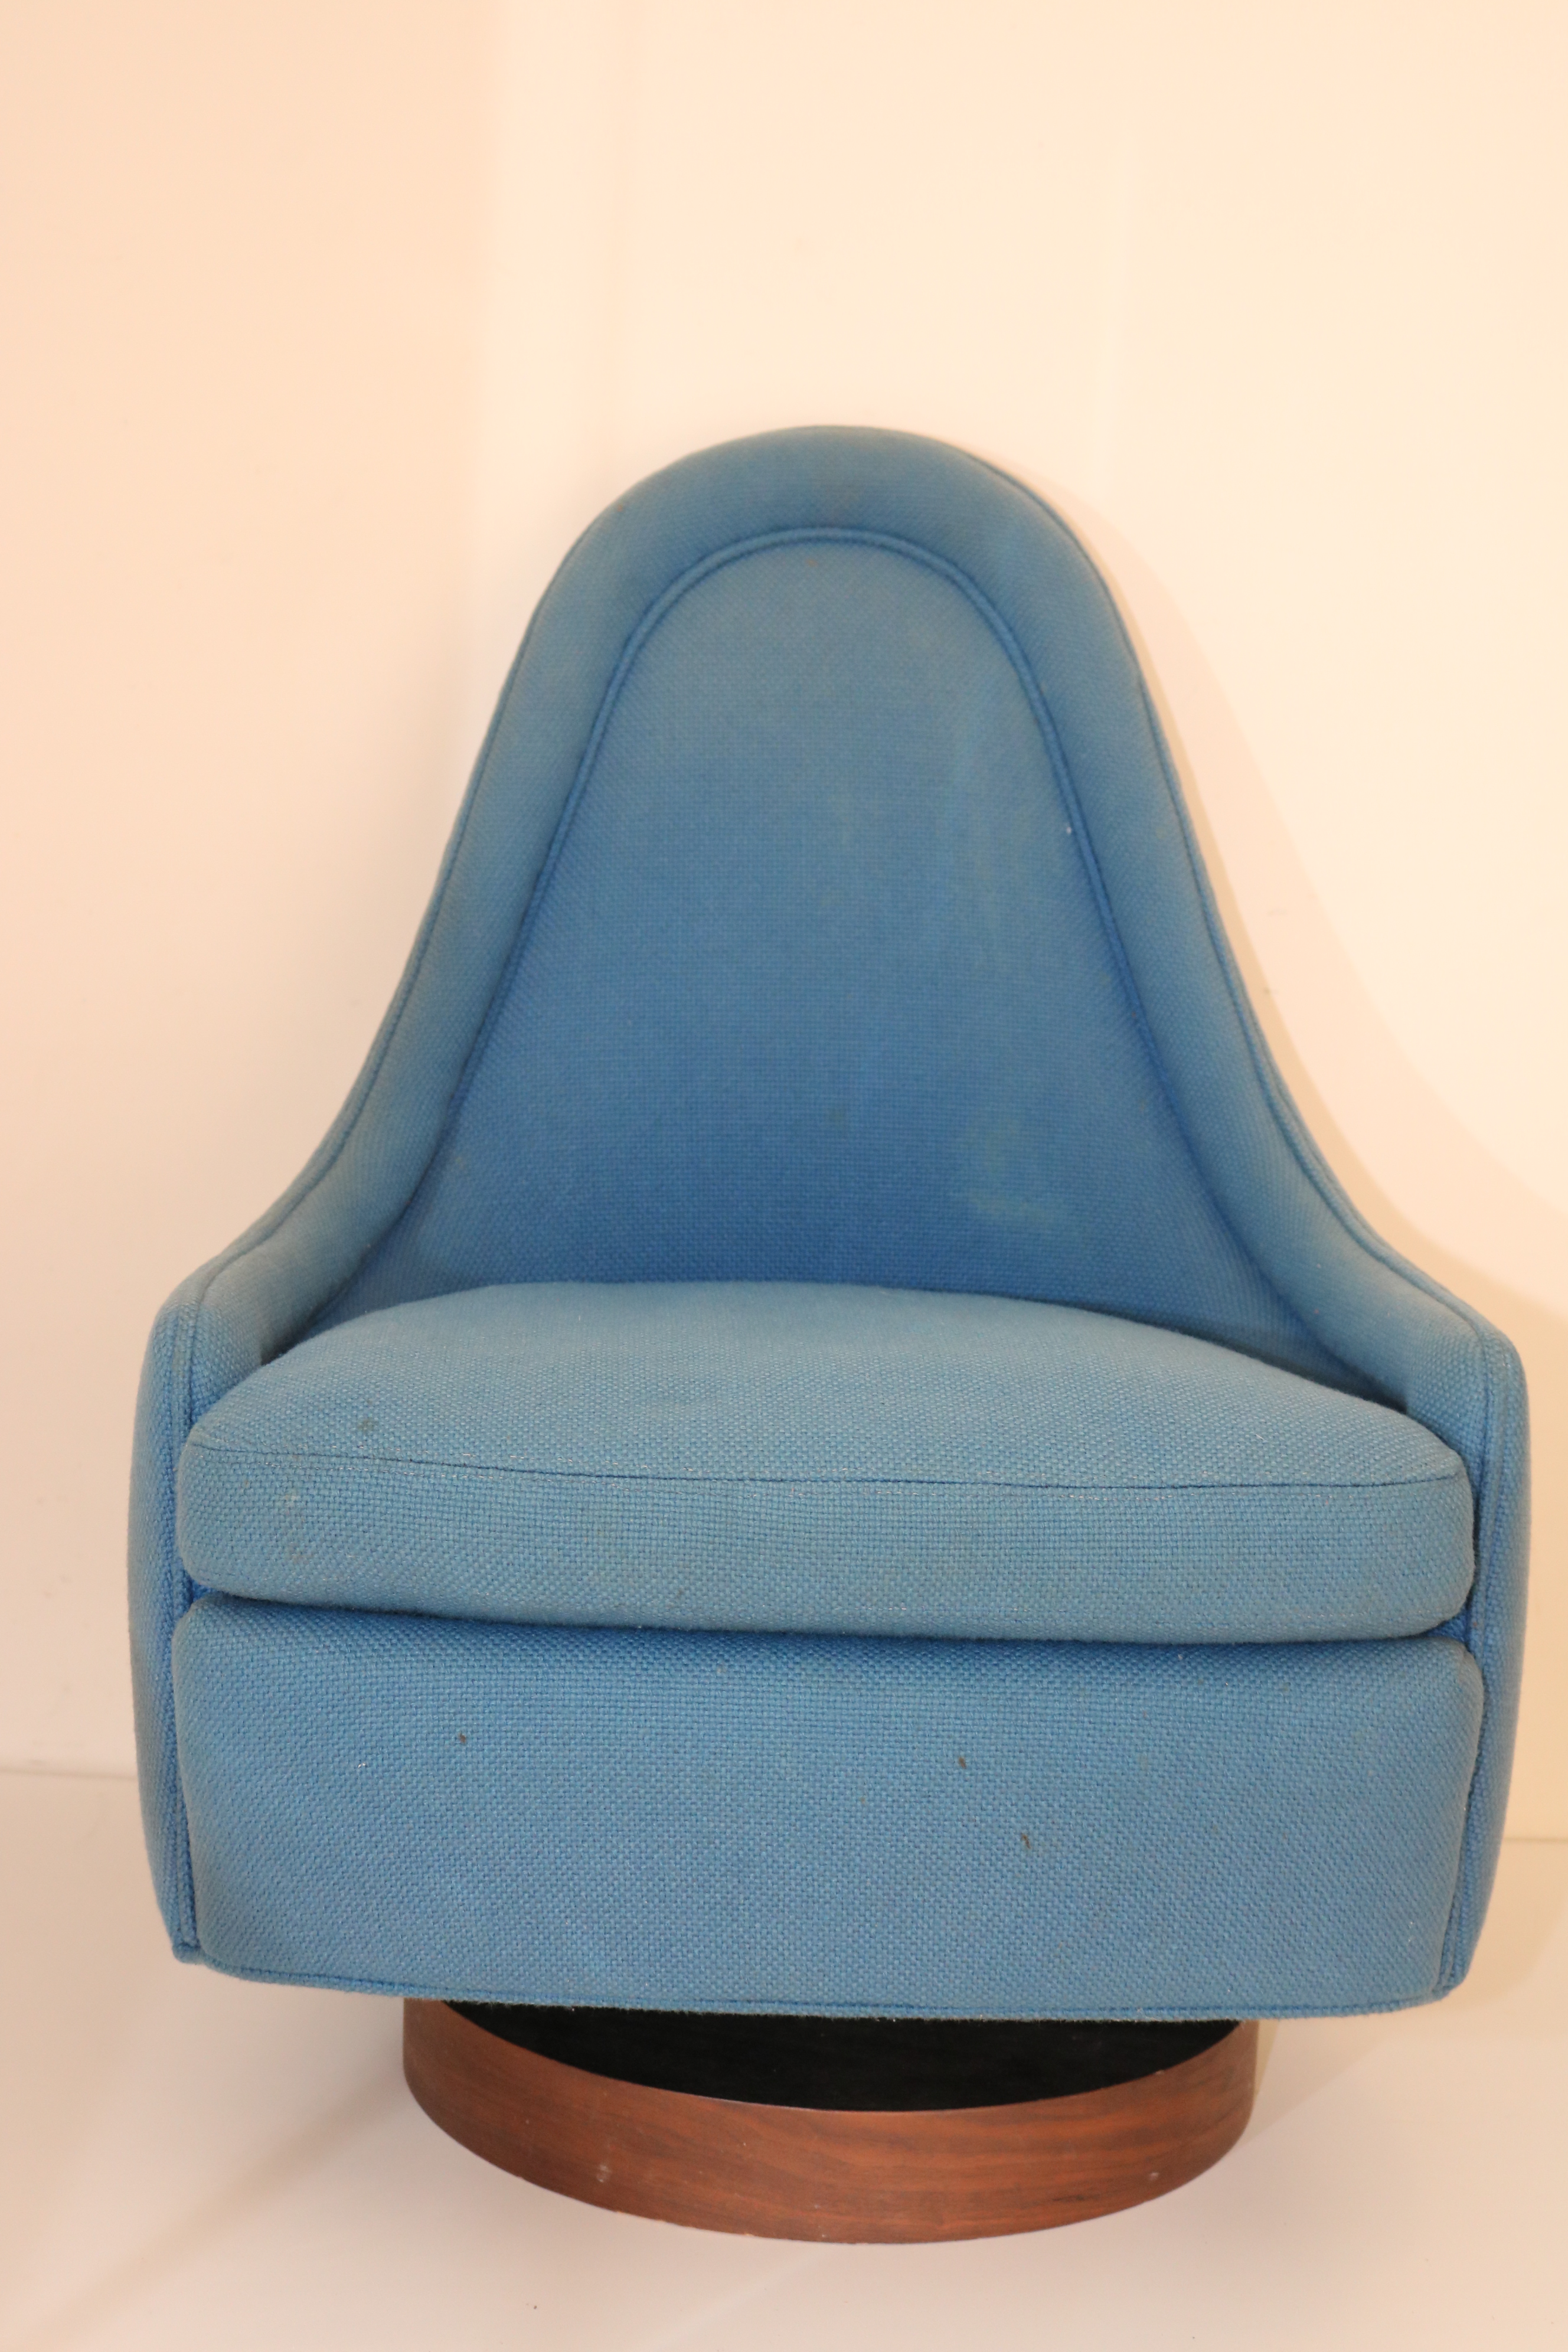 Vintage Milo Baughman Childu0027s Swivel Tilt Chair   Image 2 Of 13